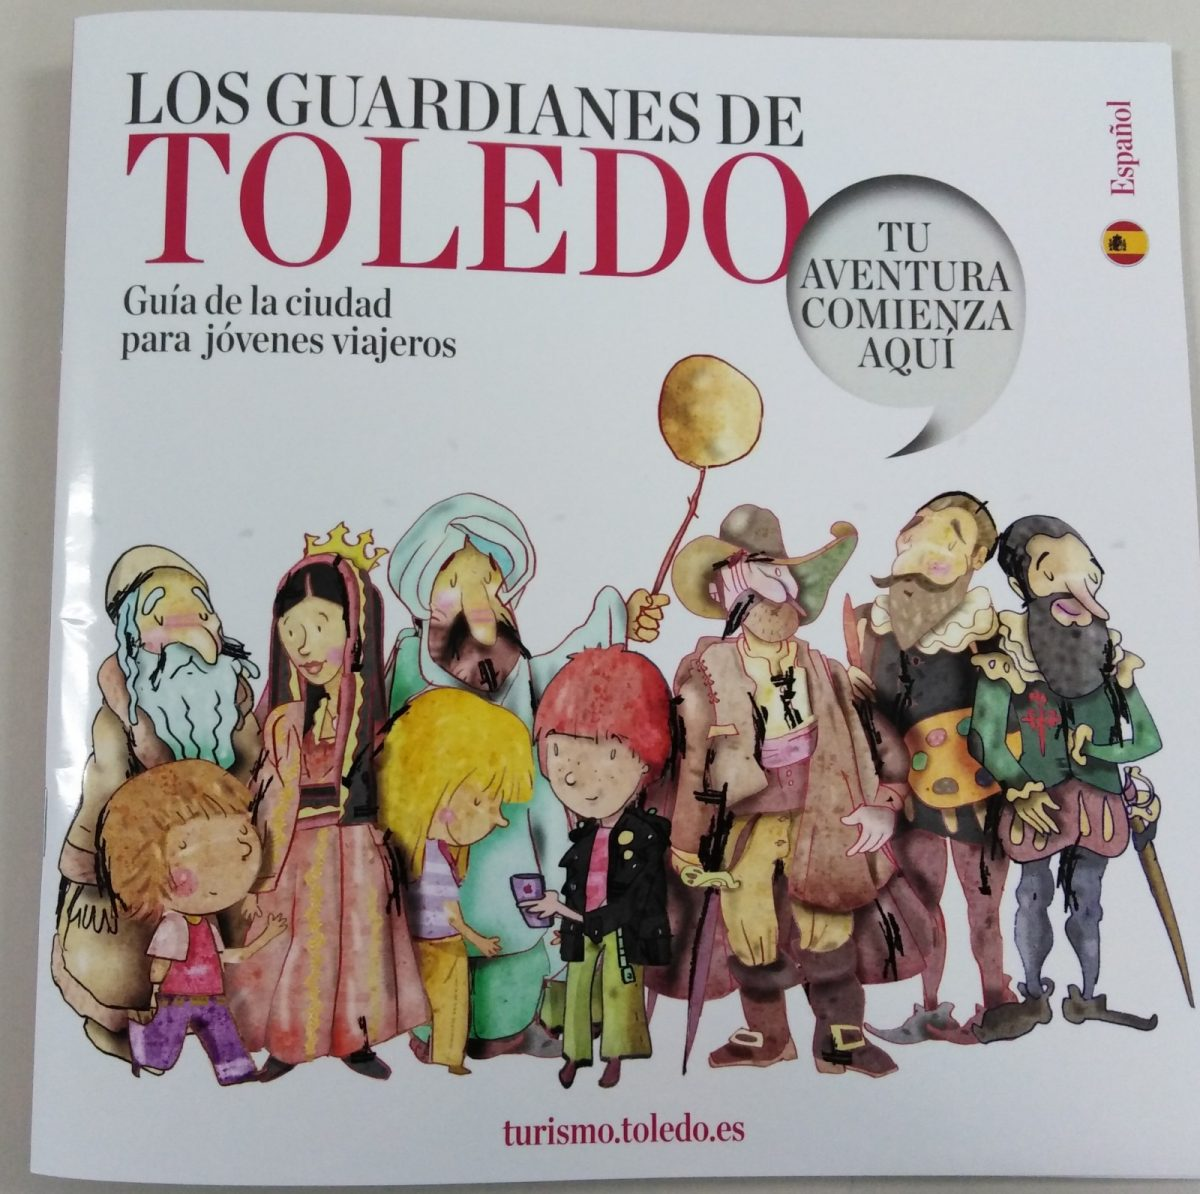 http://www.toledo.es/wp-content/uploads/2019/06/los-guardianes-de-toledo-1200x1194.jpg. Los Guardianes de Toledo. Guía de turismo familiar